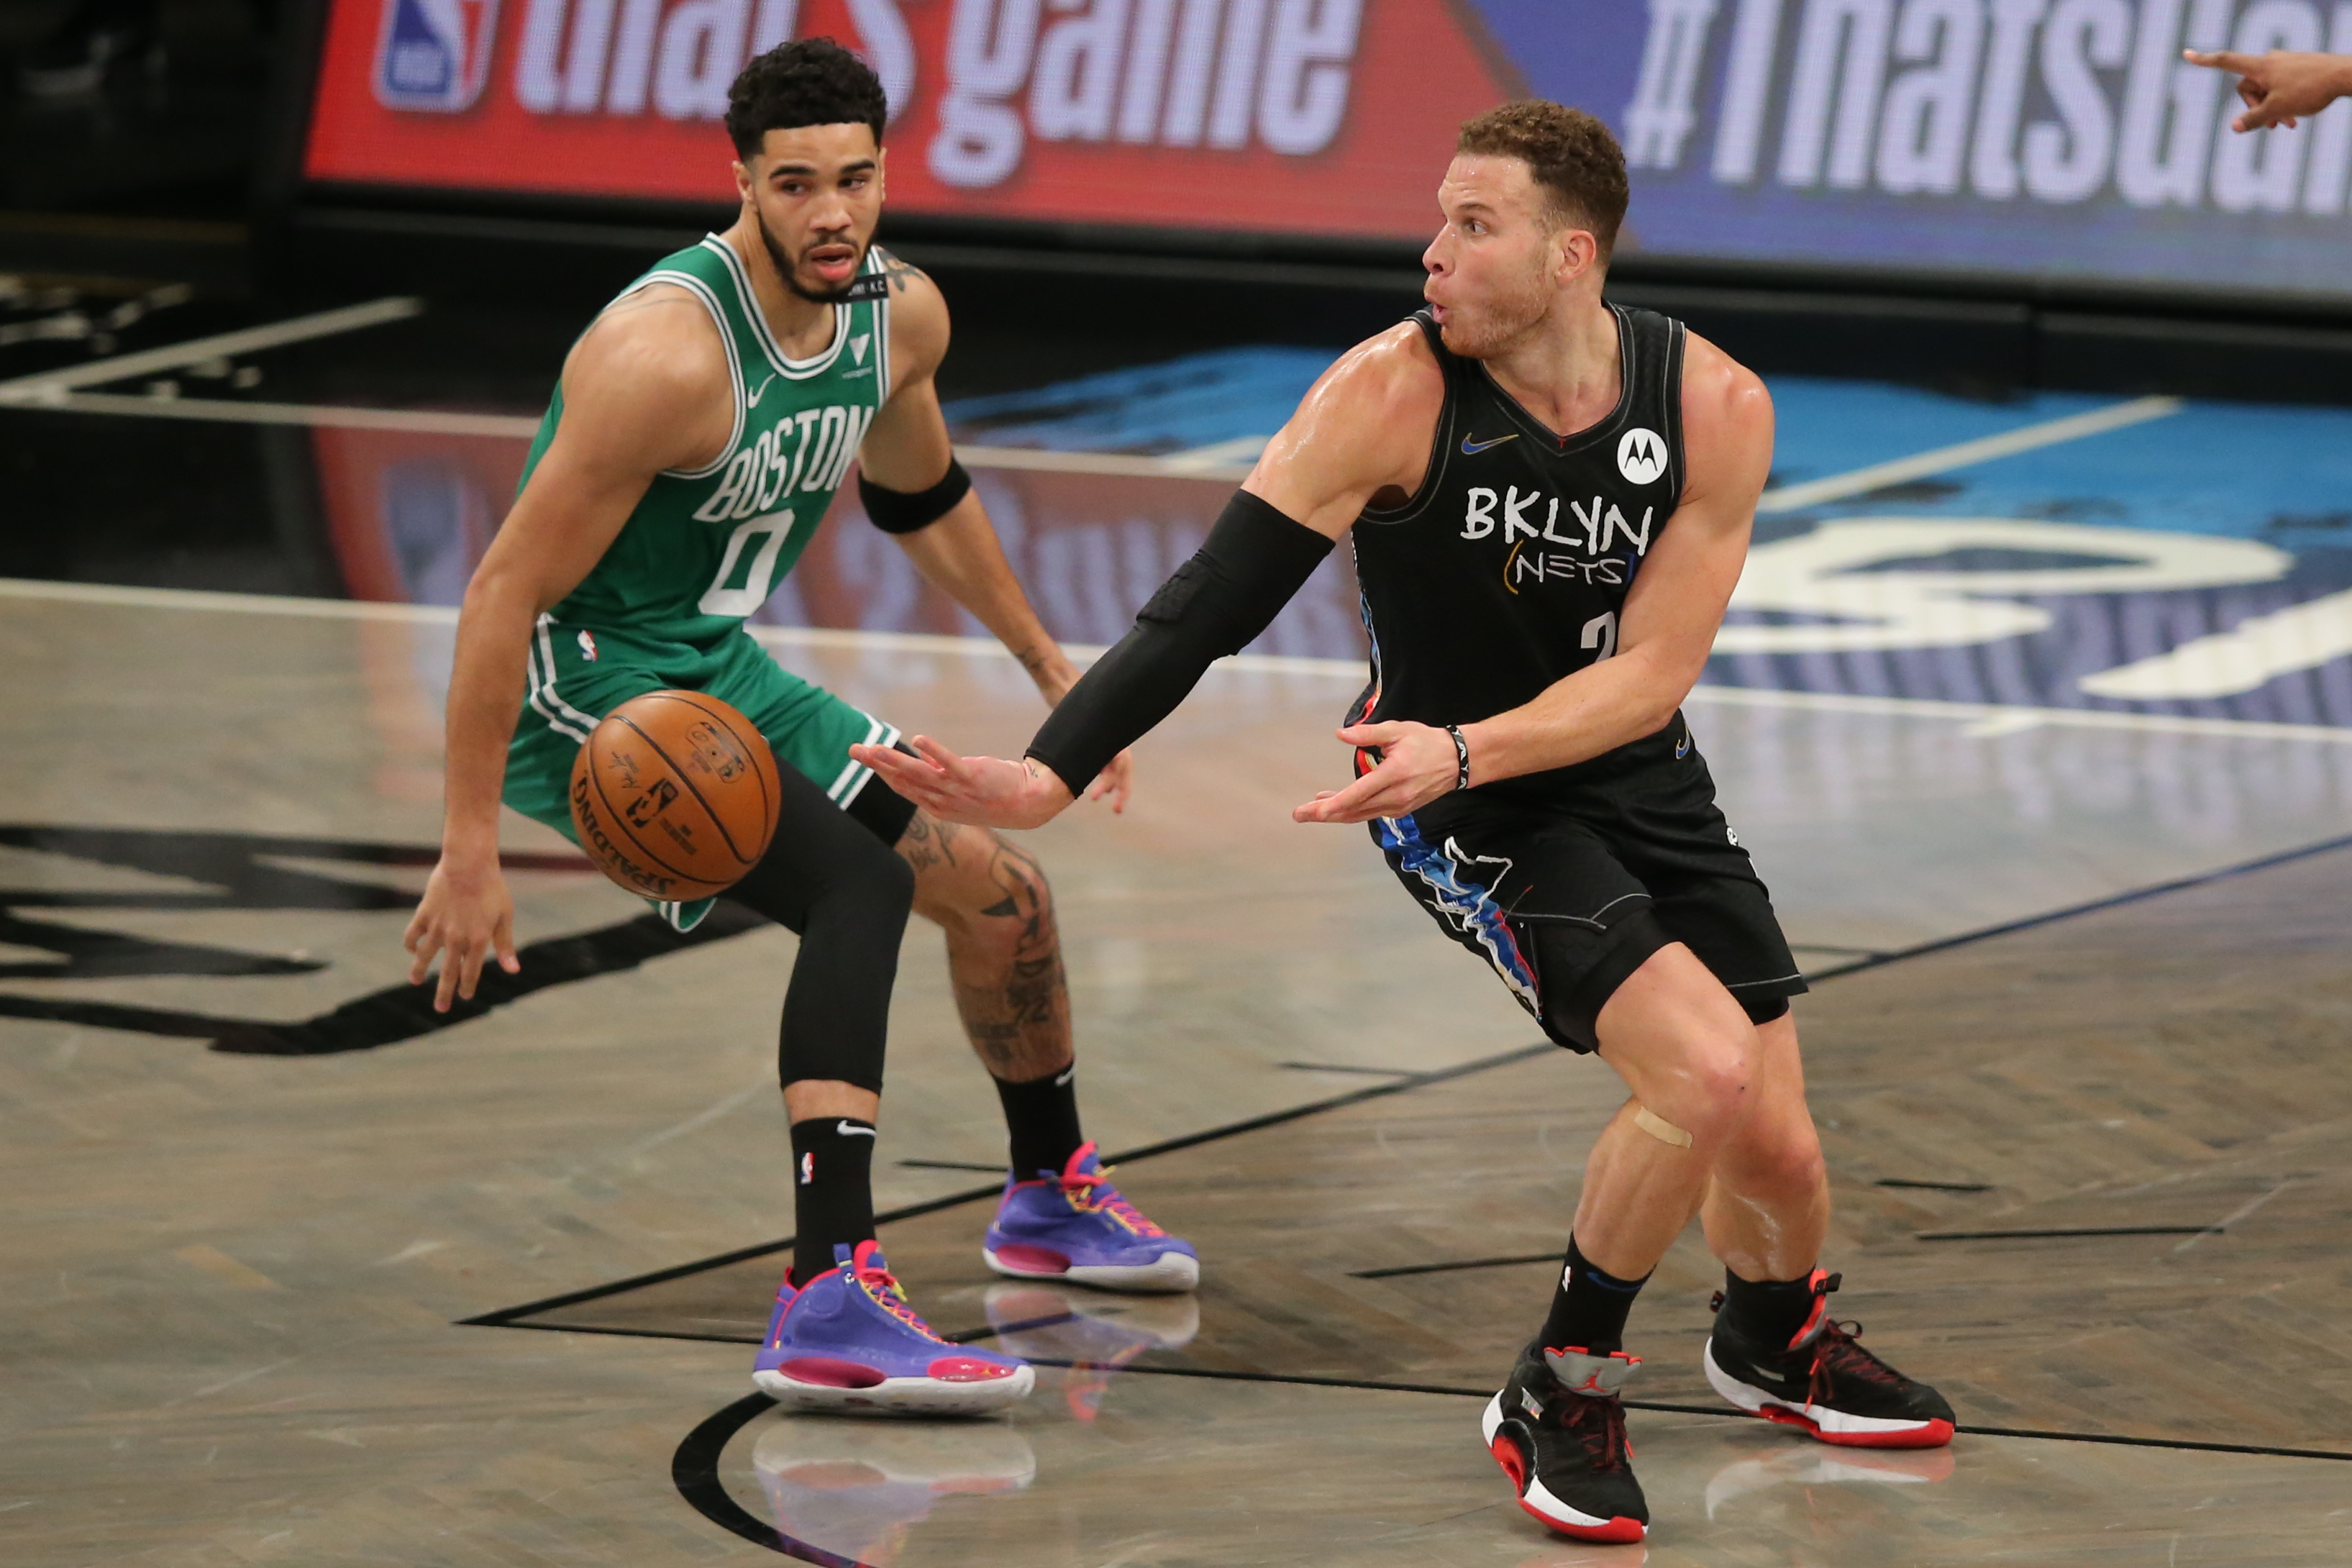 Blake Griddin, Brooklyn Nets